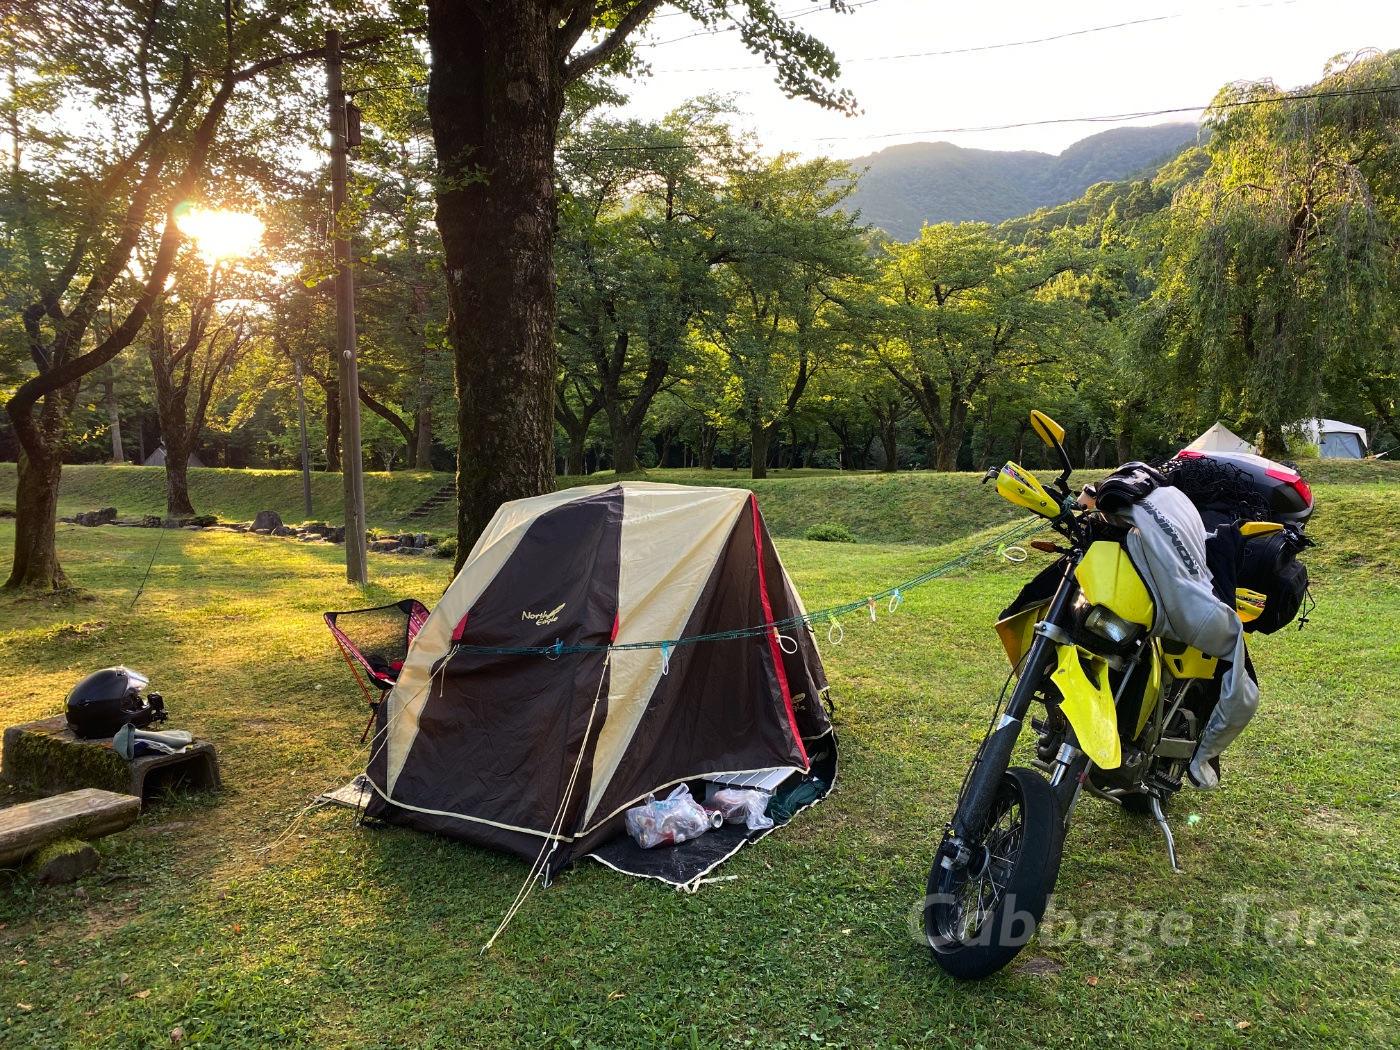 Naturehike tent cloudup2x review 04